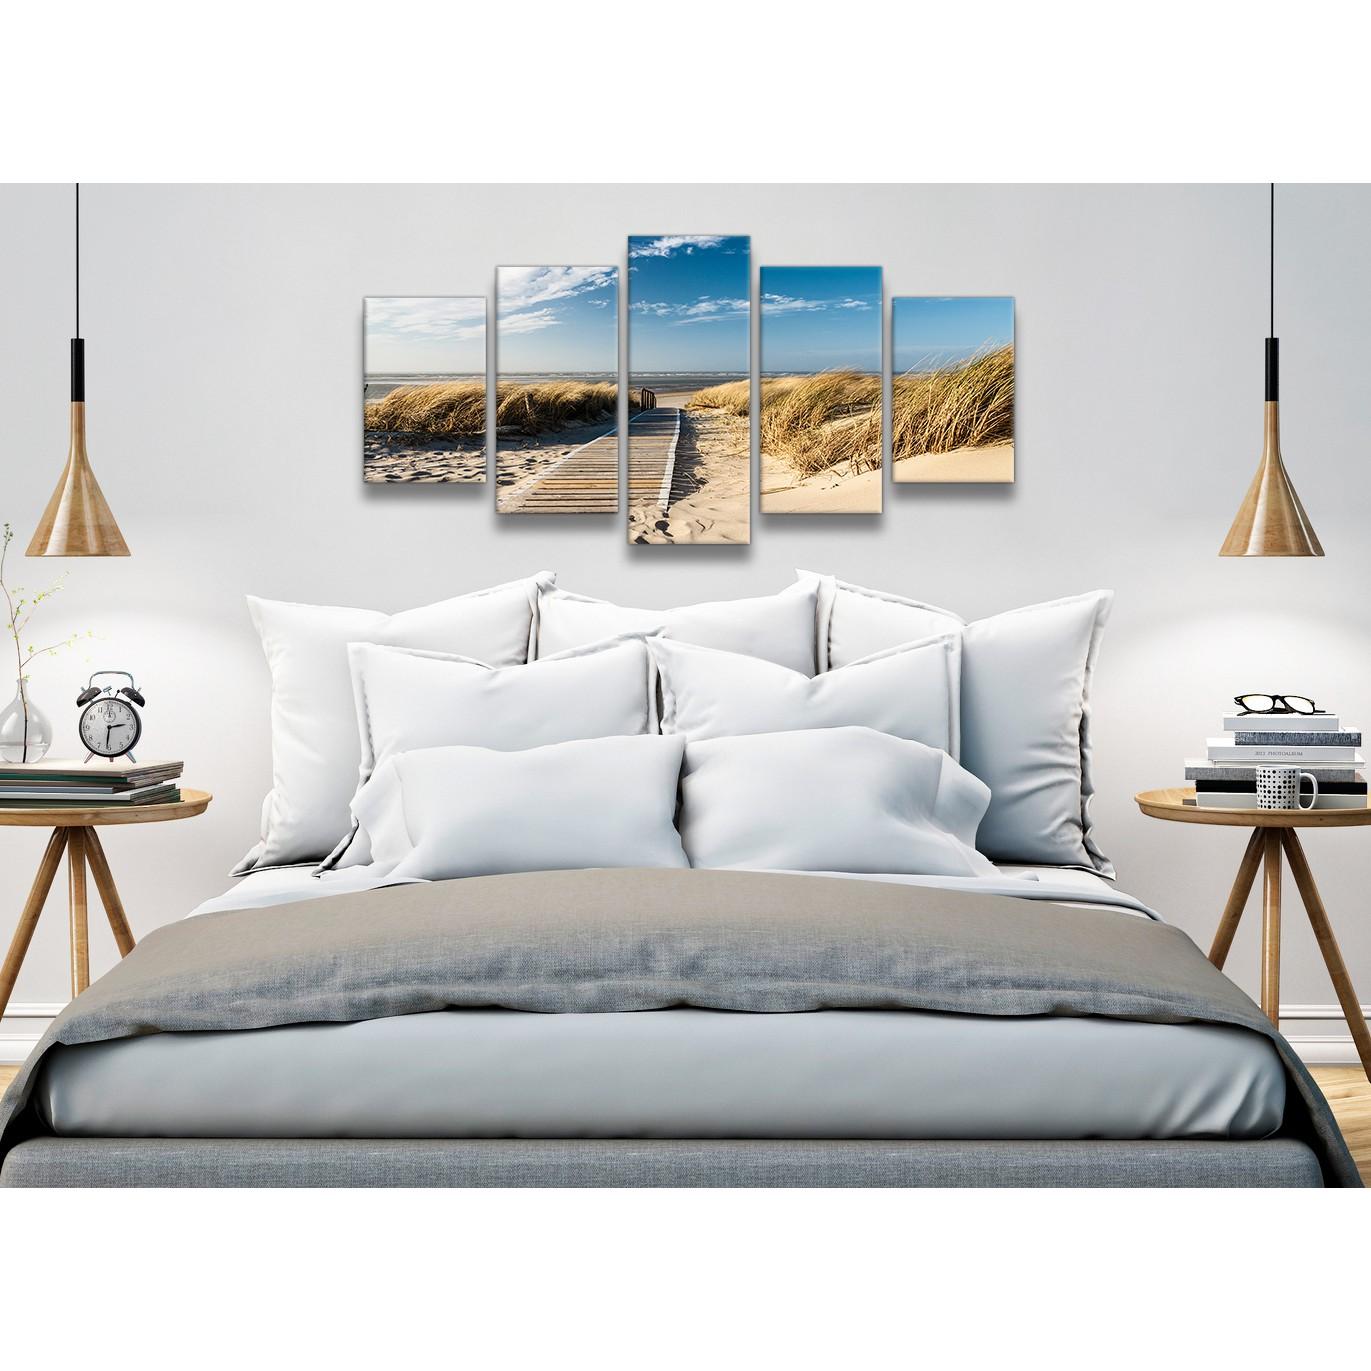 5 piece beach landscape canvas wall art pictures pathway to the ocean 5197 160cm xl set. Black Bedroom Furniture Sets. Home Design Ideas